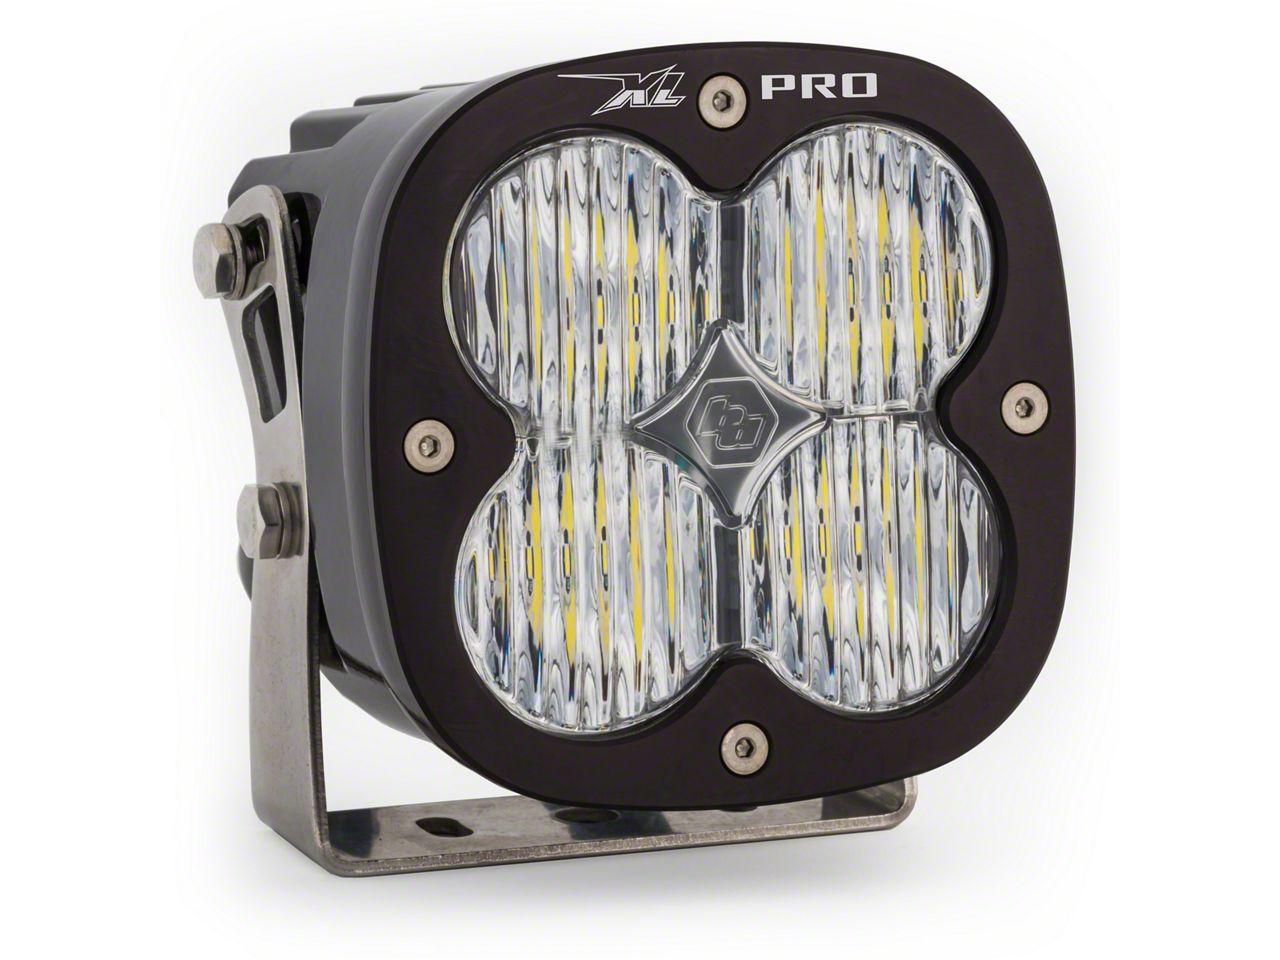 Baja Designs XL Pro LED Light - Wide Cornering Beam